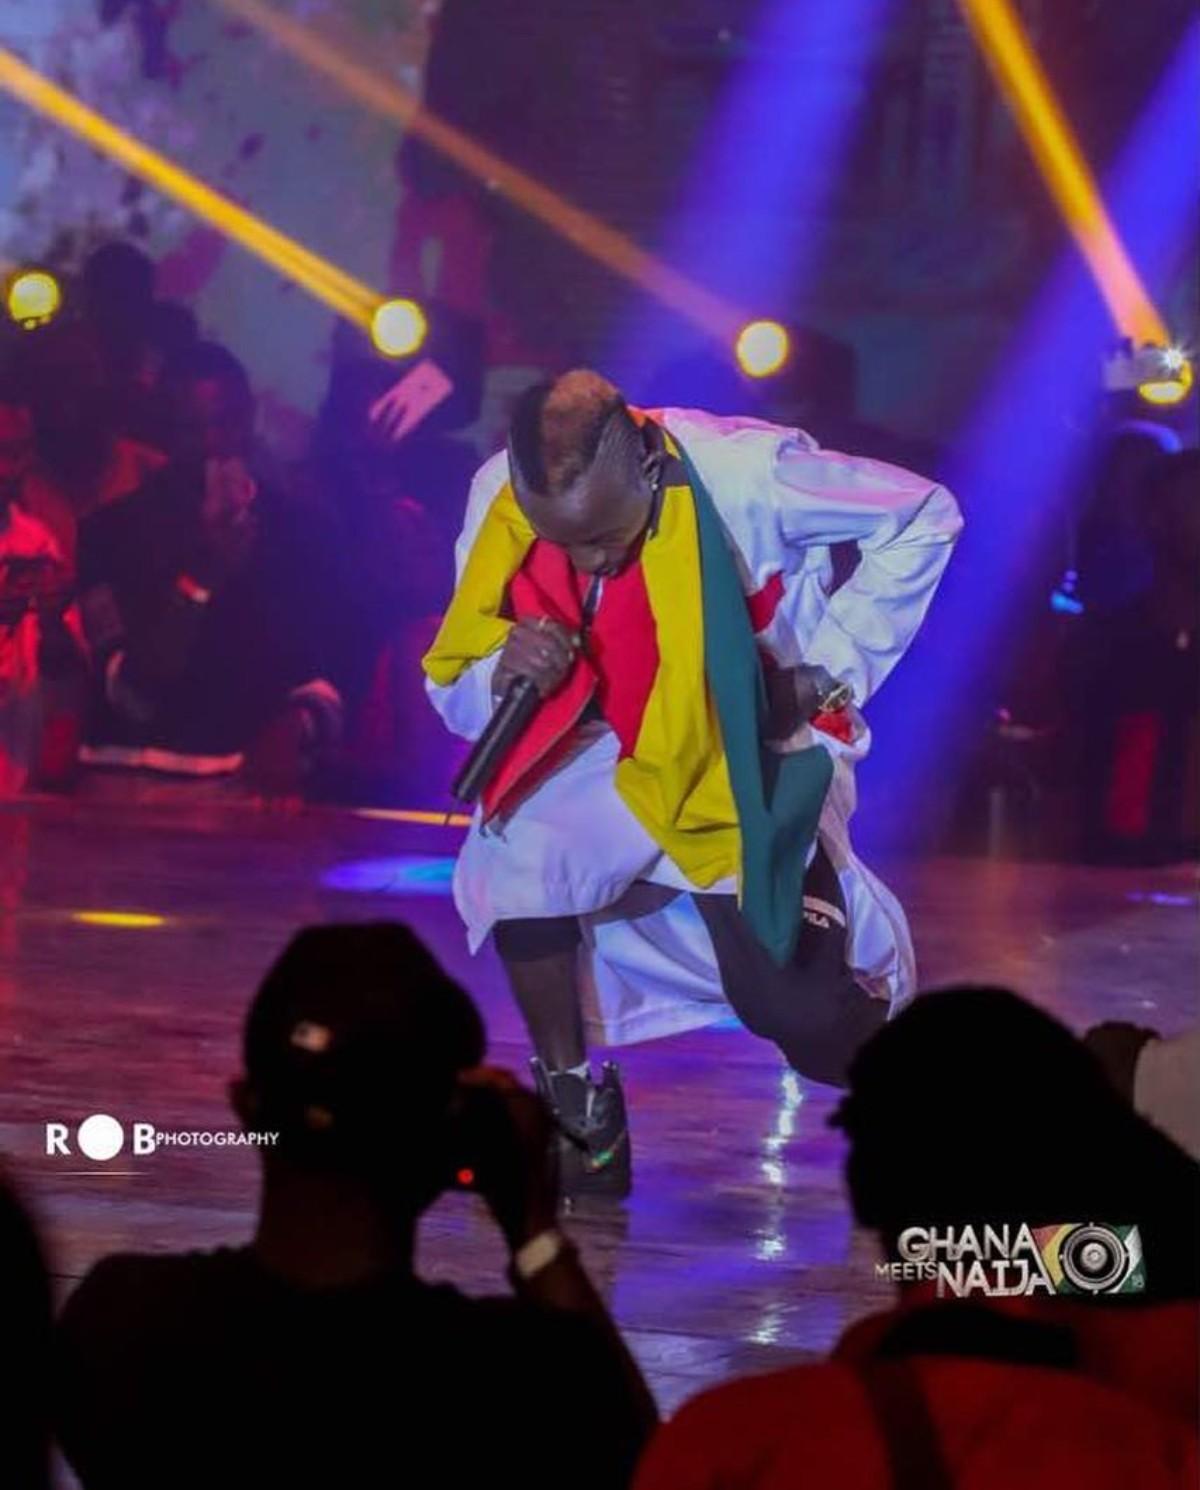 Patapaa Performance Ghana Meets Naija 2018